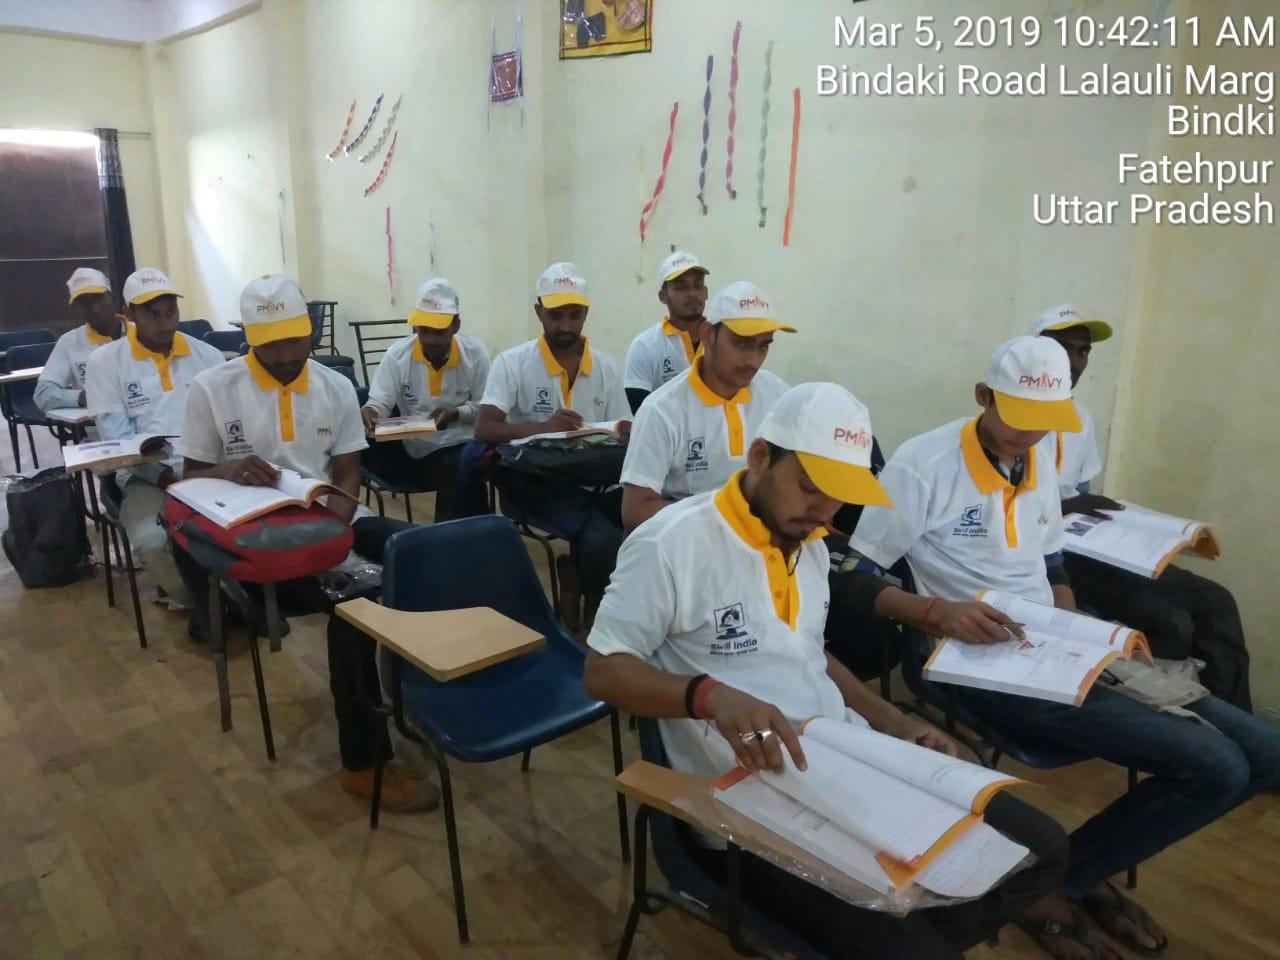 Saubhagya OJT & Kit Distribution Program by Sona Yukti at Fatehpur Bhindki